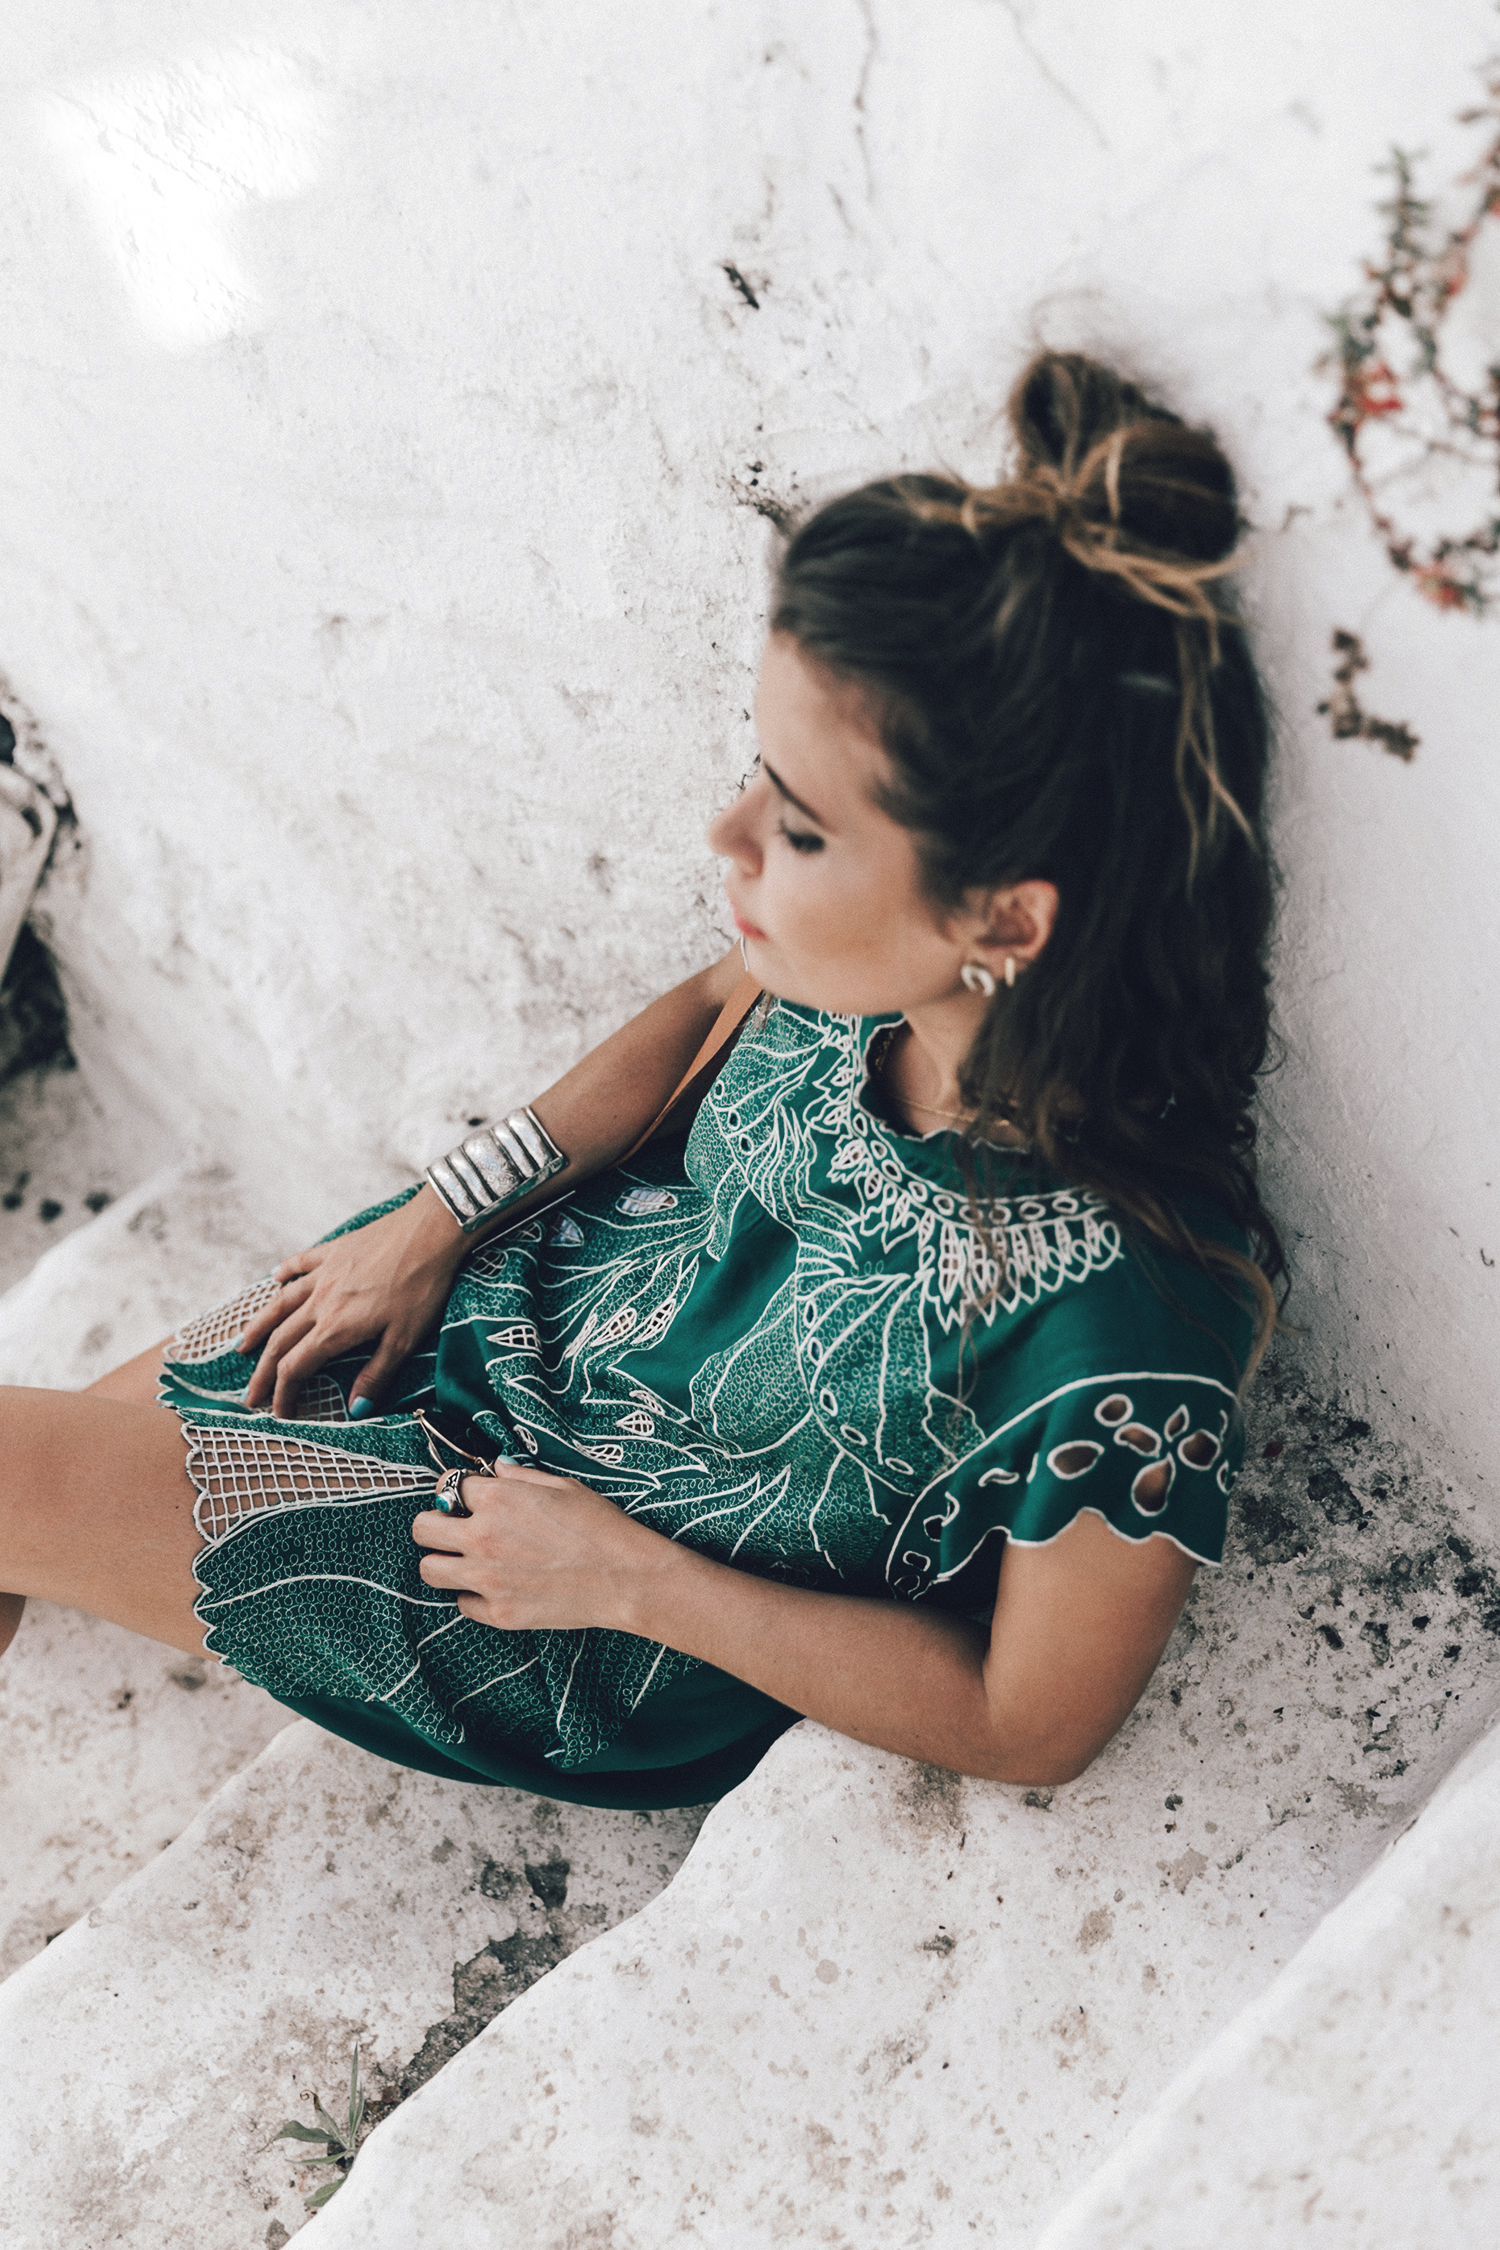 Tularosa_Dress-Soludos_Escapes-Soludos_Espadrilles-Sezane_Bag-Leather_Crossbody_Bag-Boho_Outfit-Look-Ray_Ban-Street_Style-Mykonos-Greece-Collage_Vintage-88-Recuperado